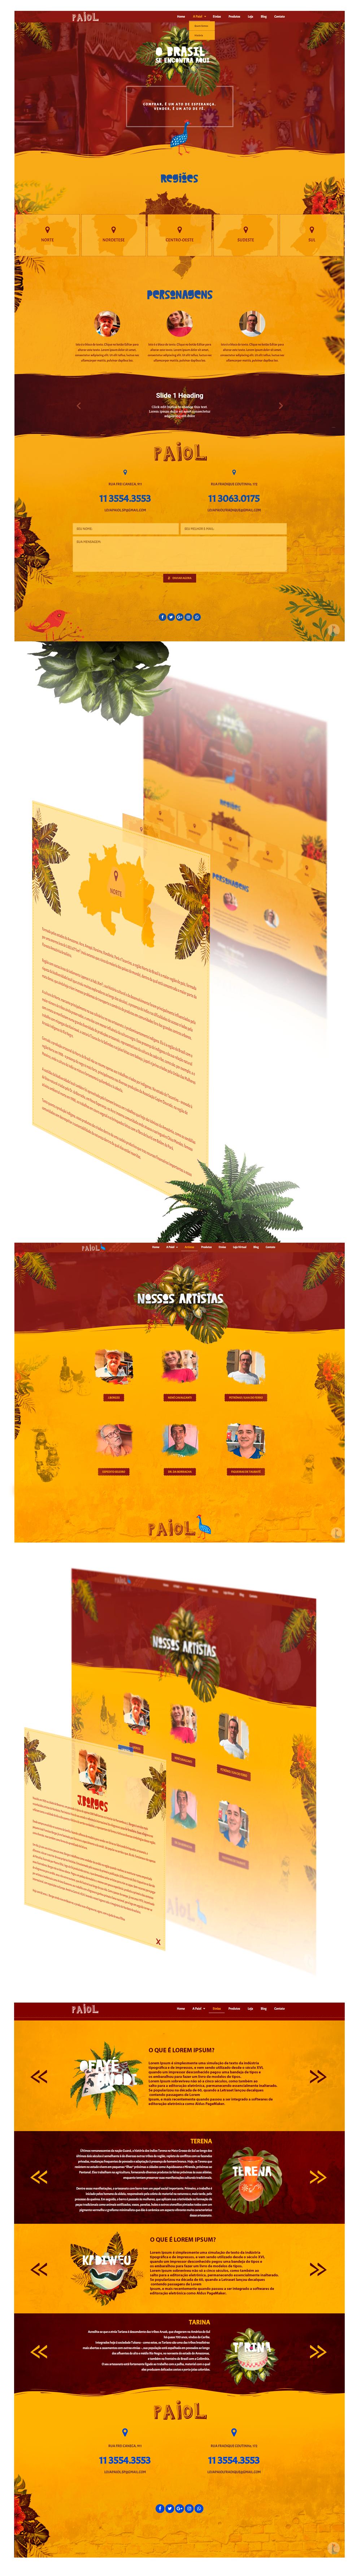 Web site Web Design  Layout wordpress Tribos etnias artesanato